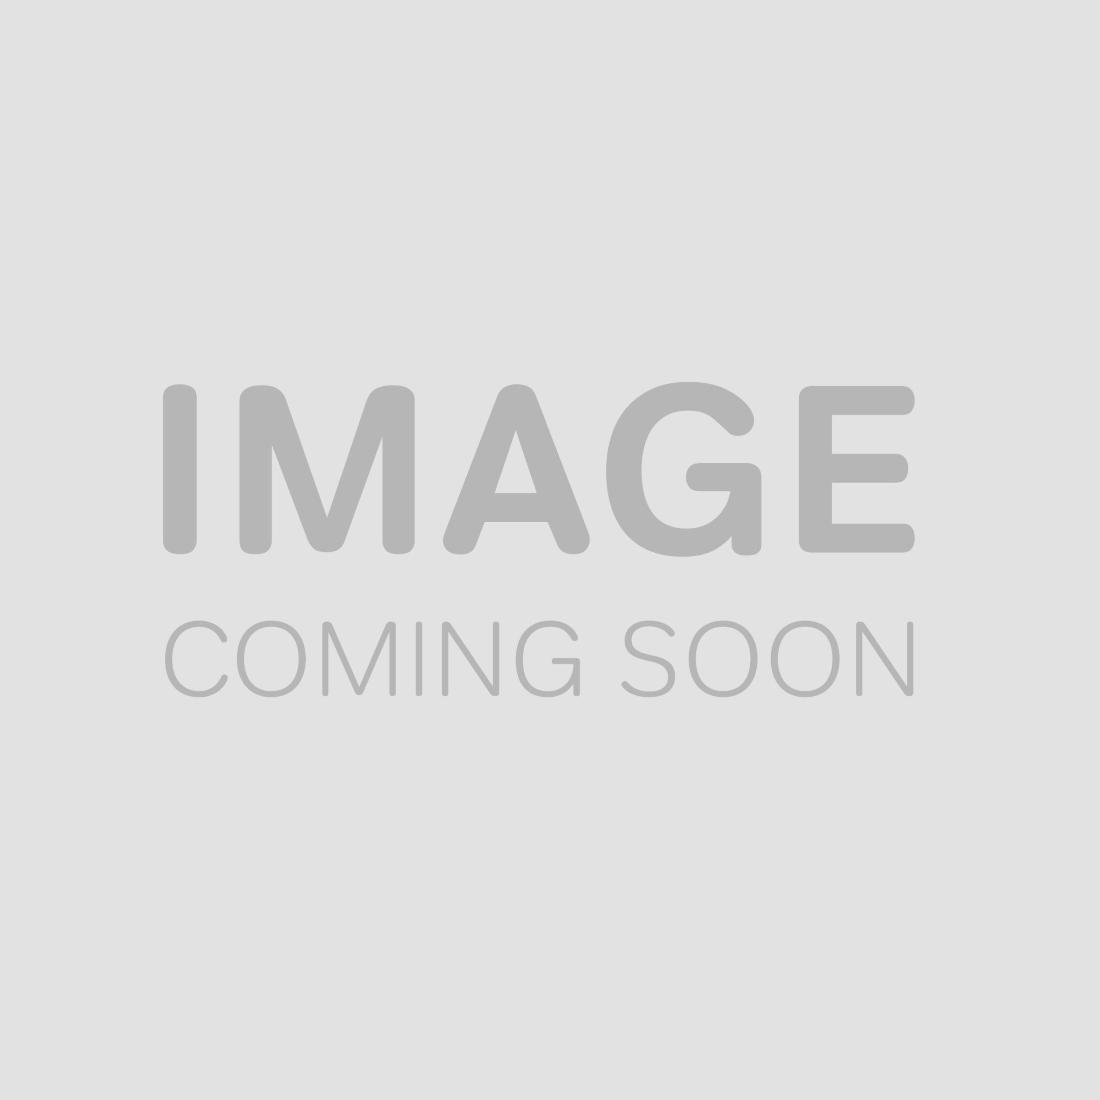 Safehip AirX Unisex - X Small - 65-85cm hip